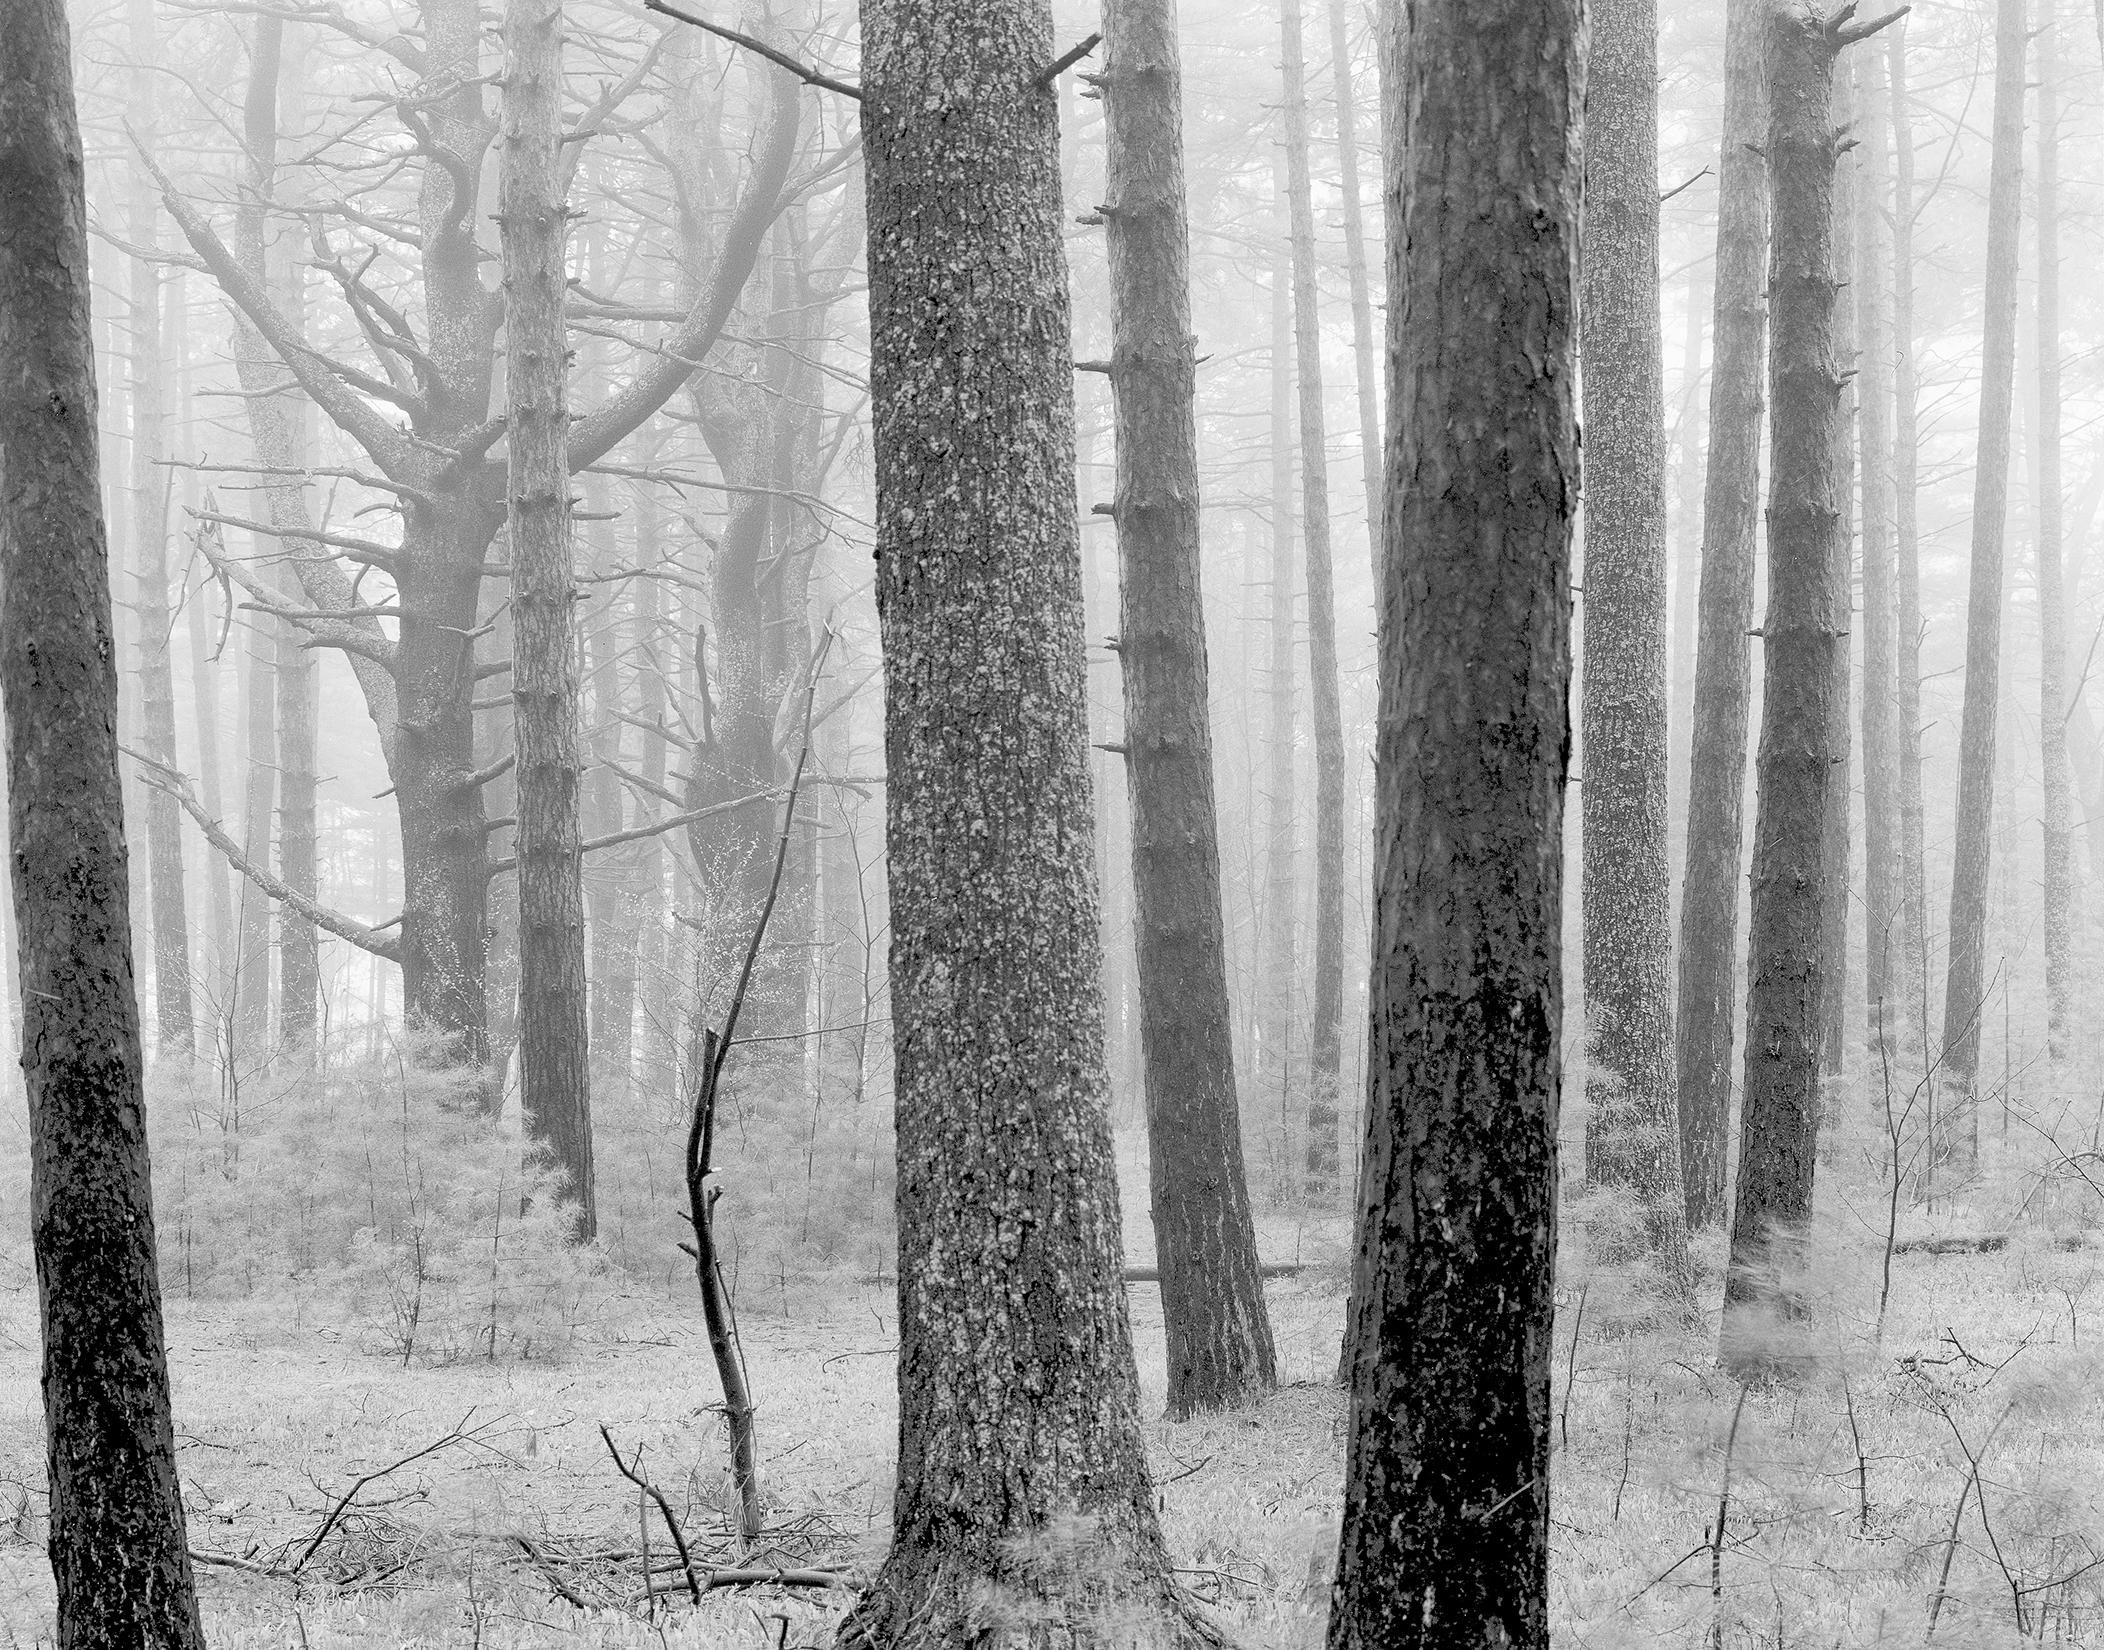 Pine Trees in Rain